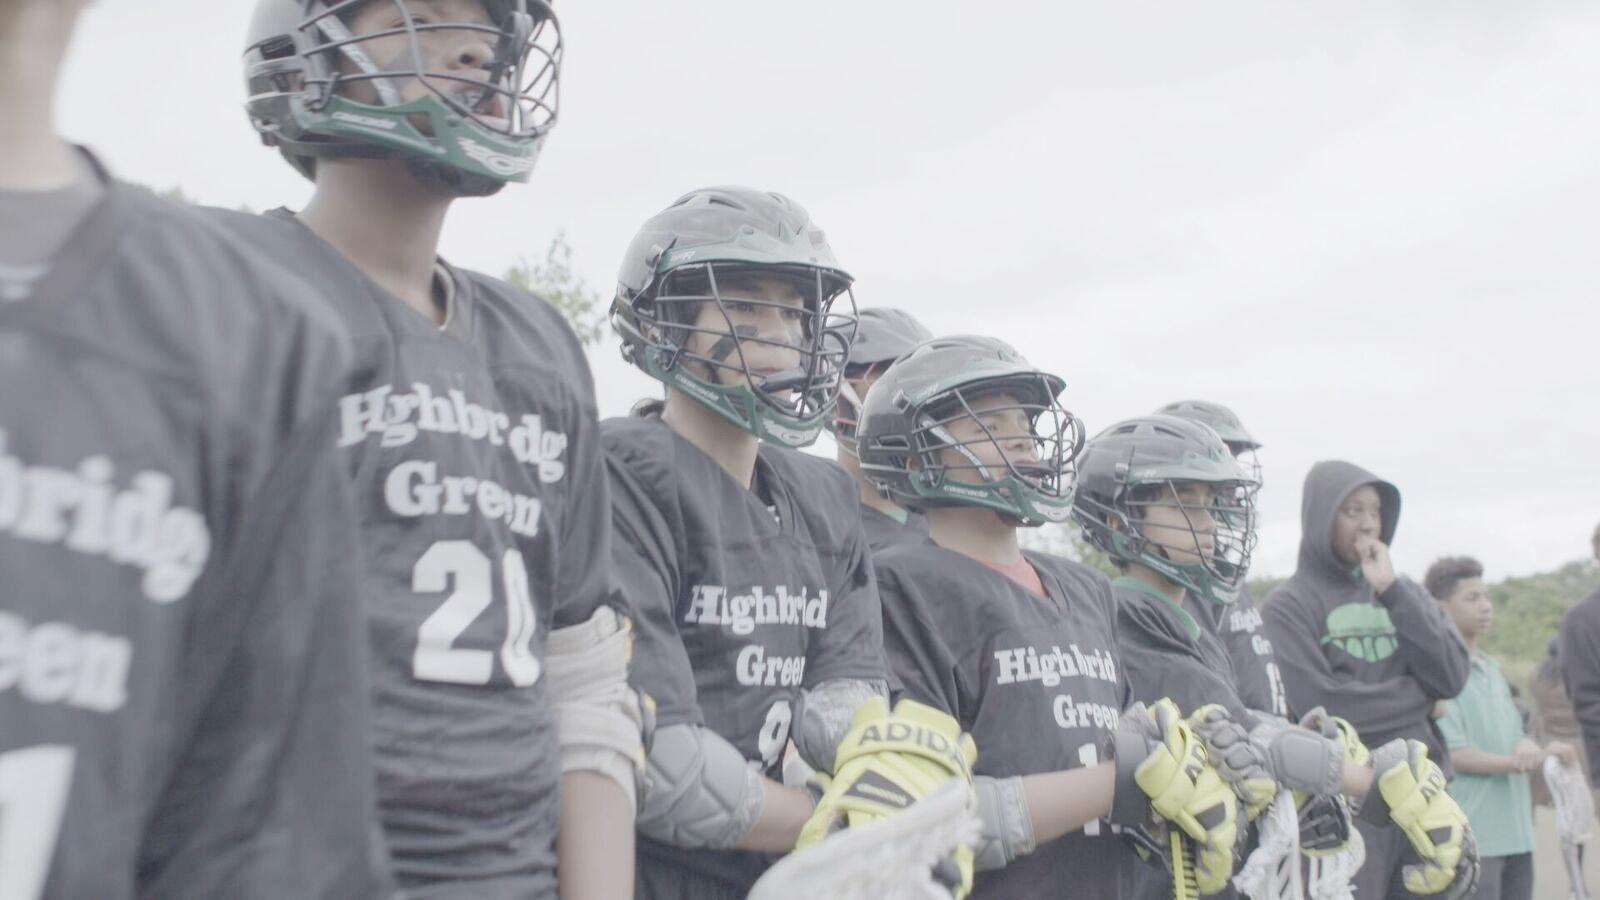 NYC Lacrosse